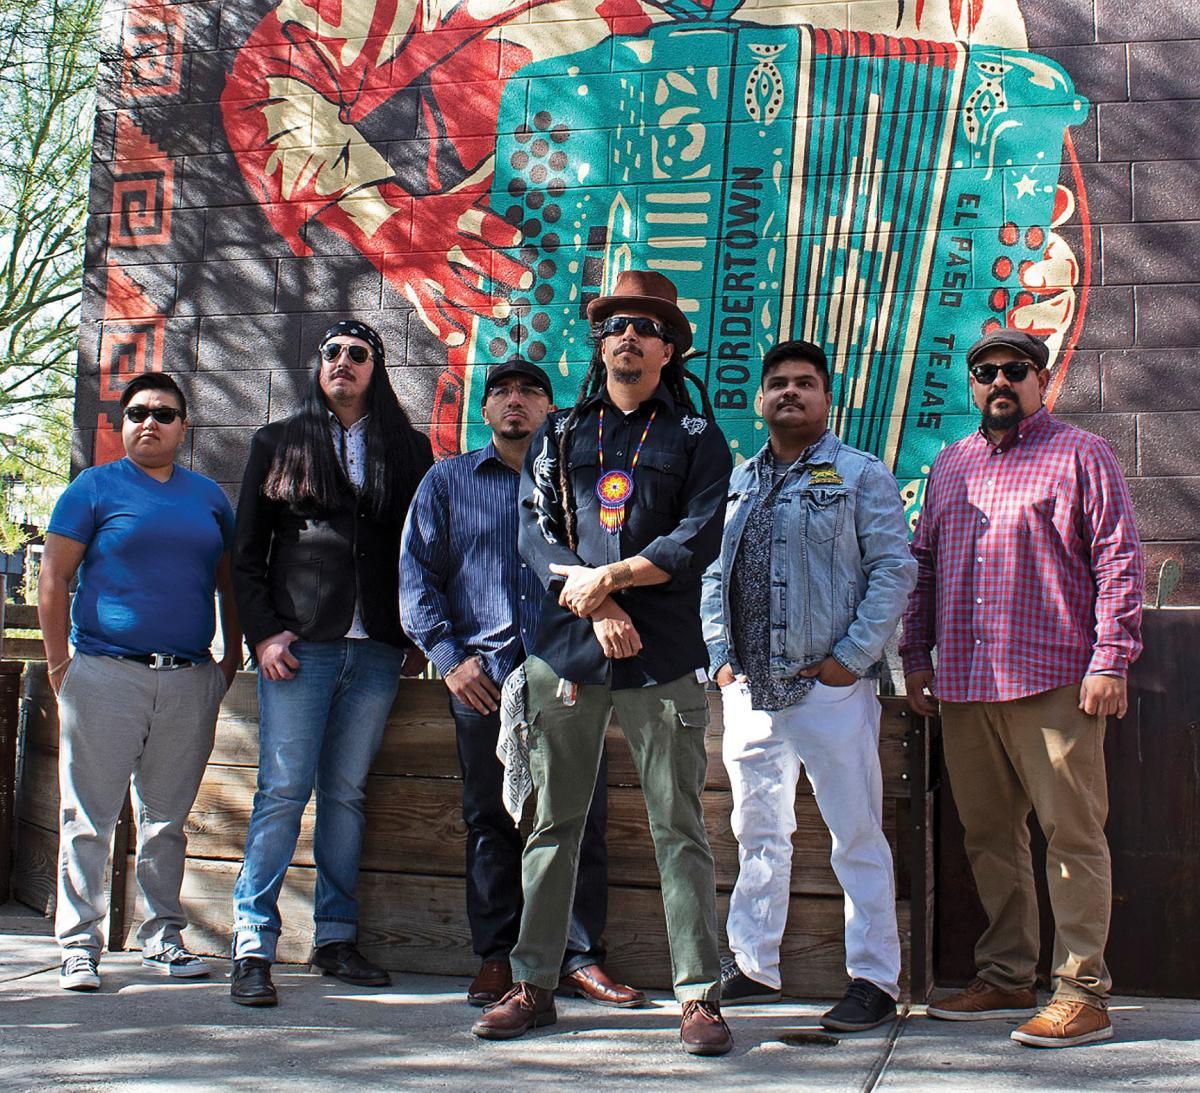 Radio La Chusma mashes up reggae, cumbia, worldbeat, and rock rhythms